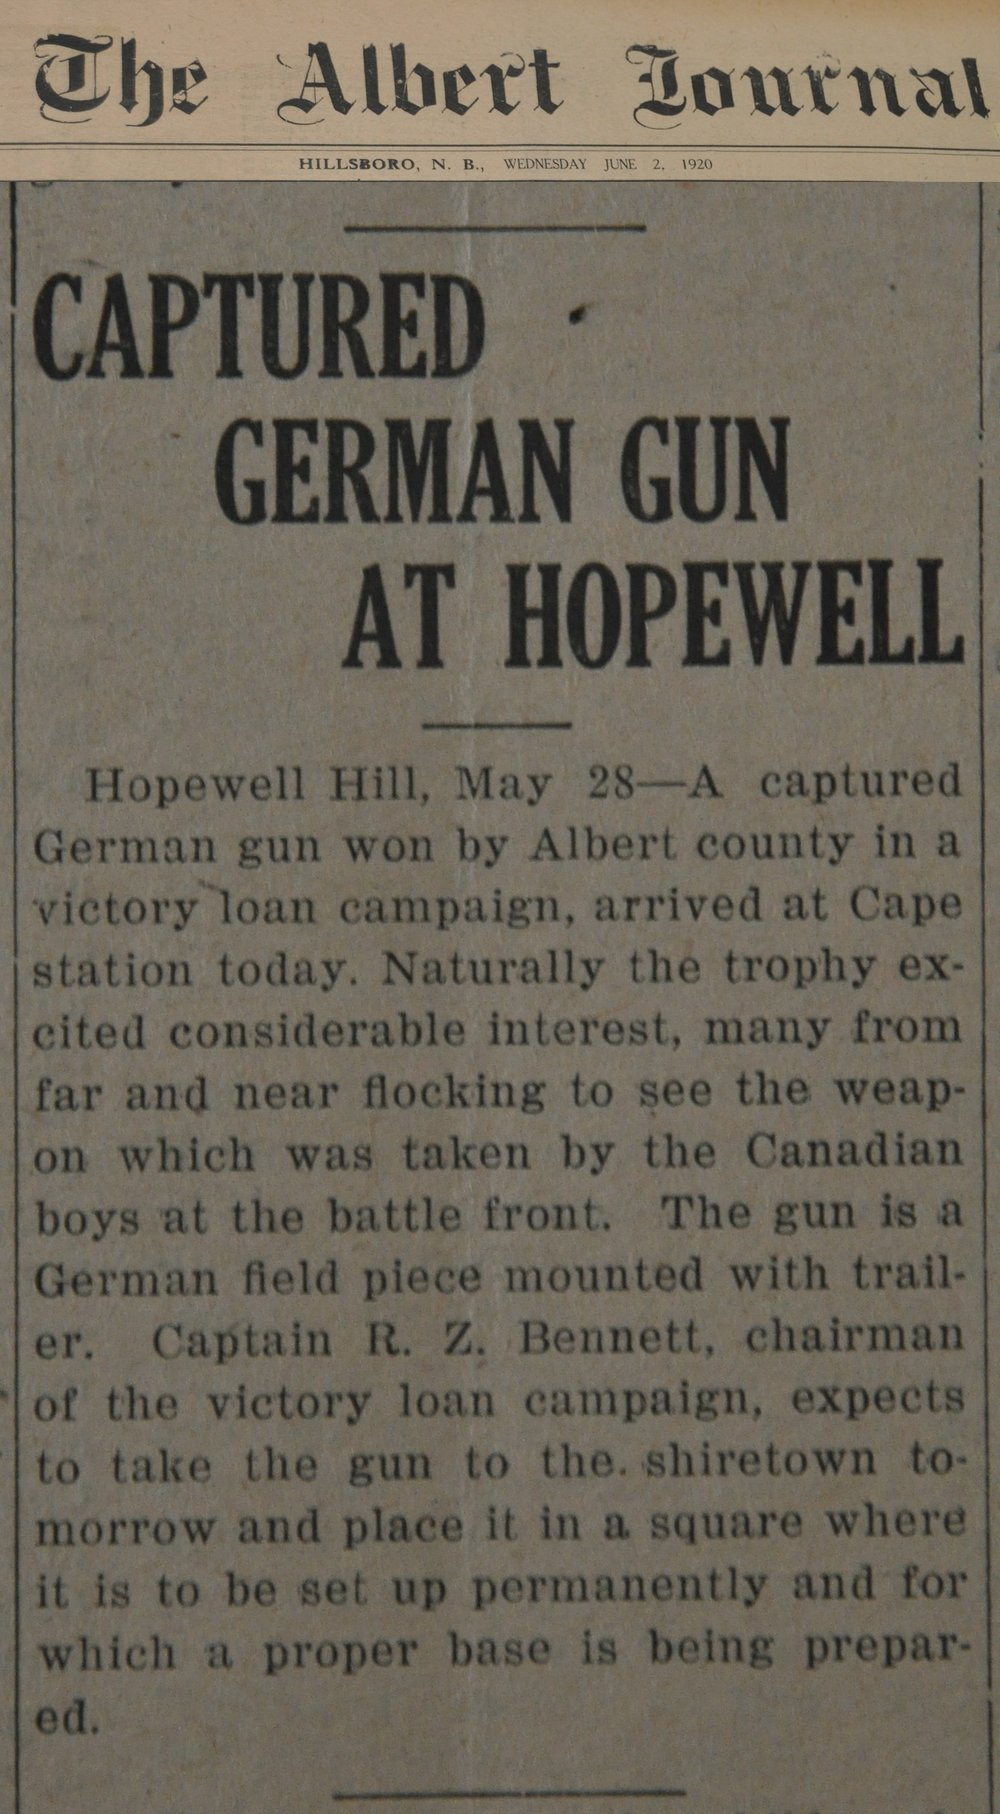 Albert Journal June 2, 1920